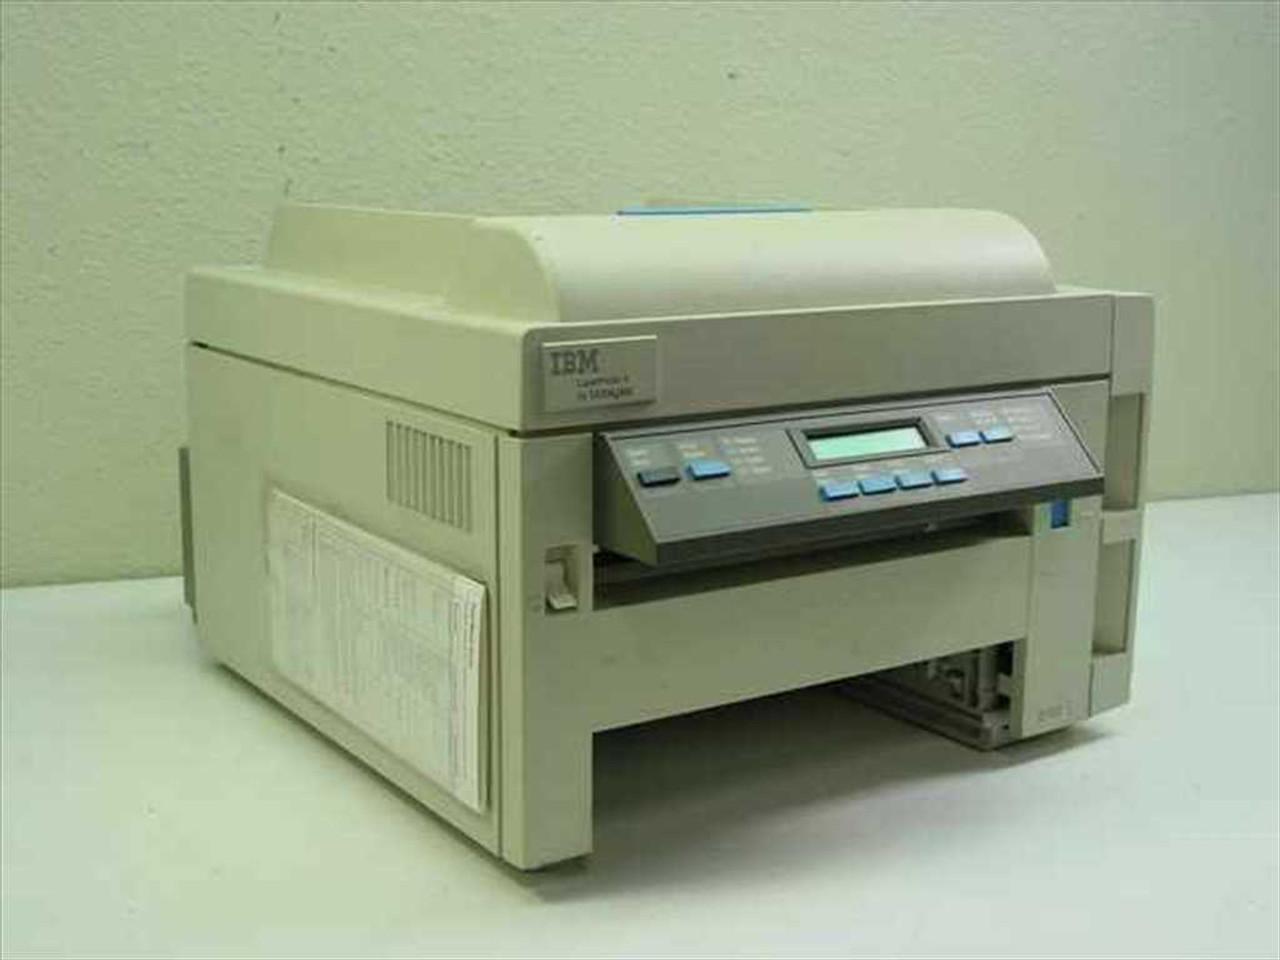 IBM 4029-020 Lexmark Laser Printer 6 - Parts Unit ...